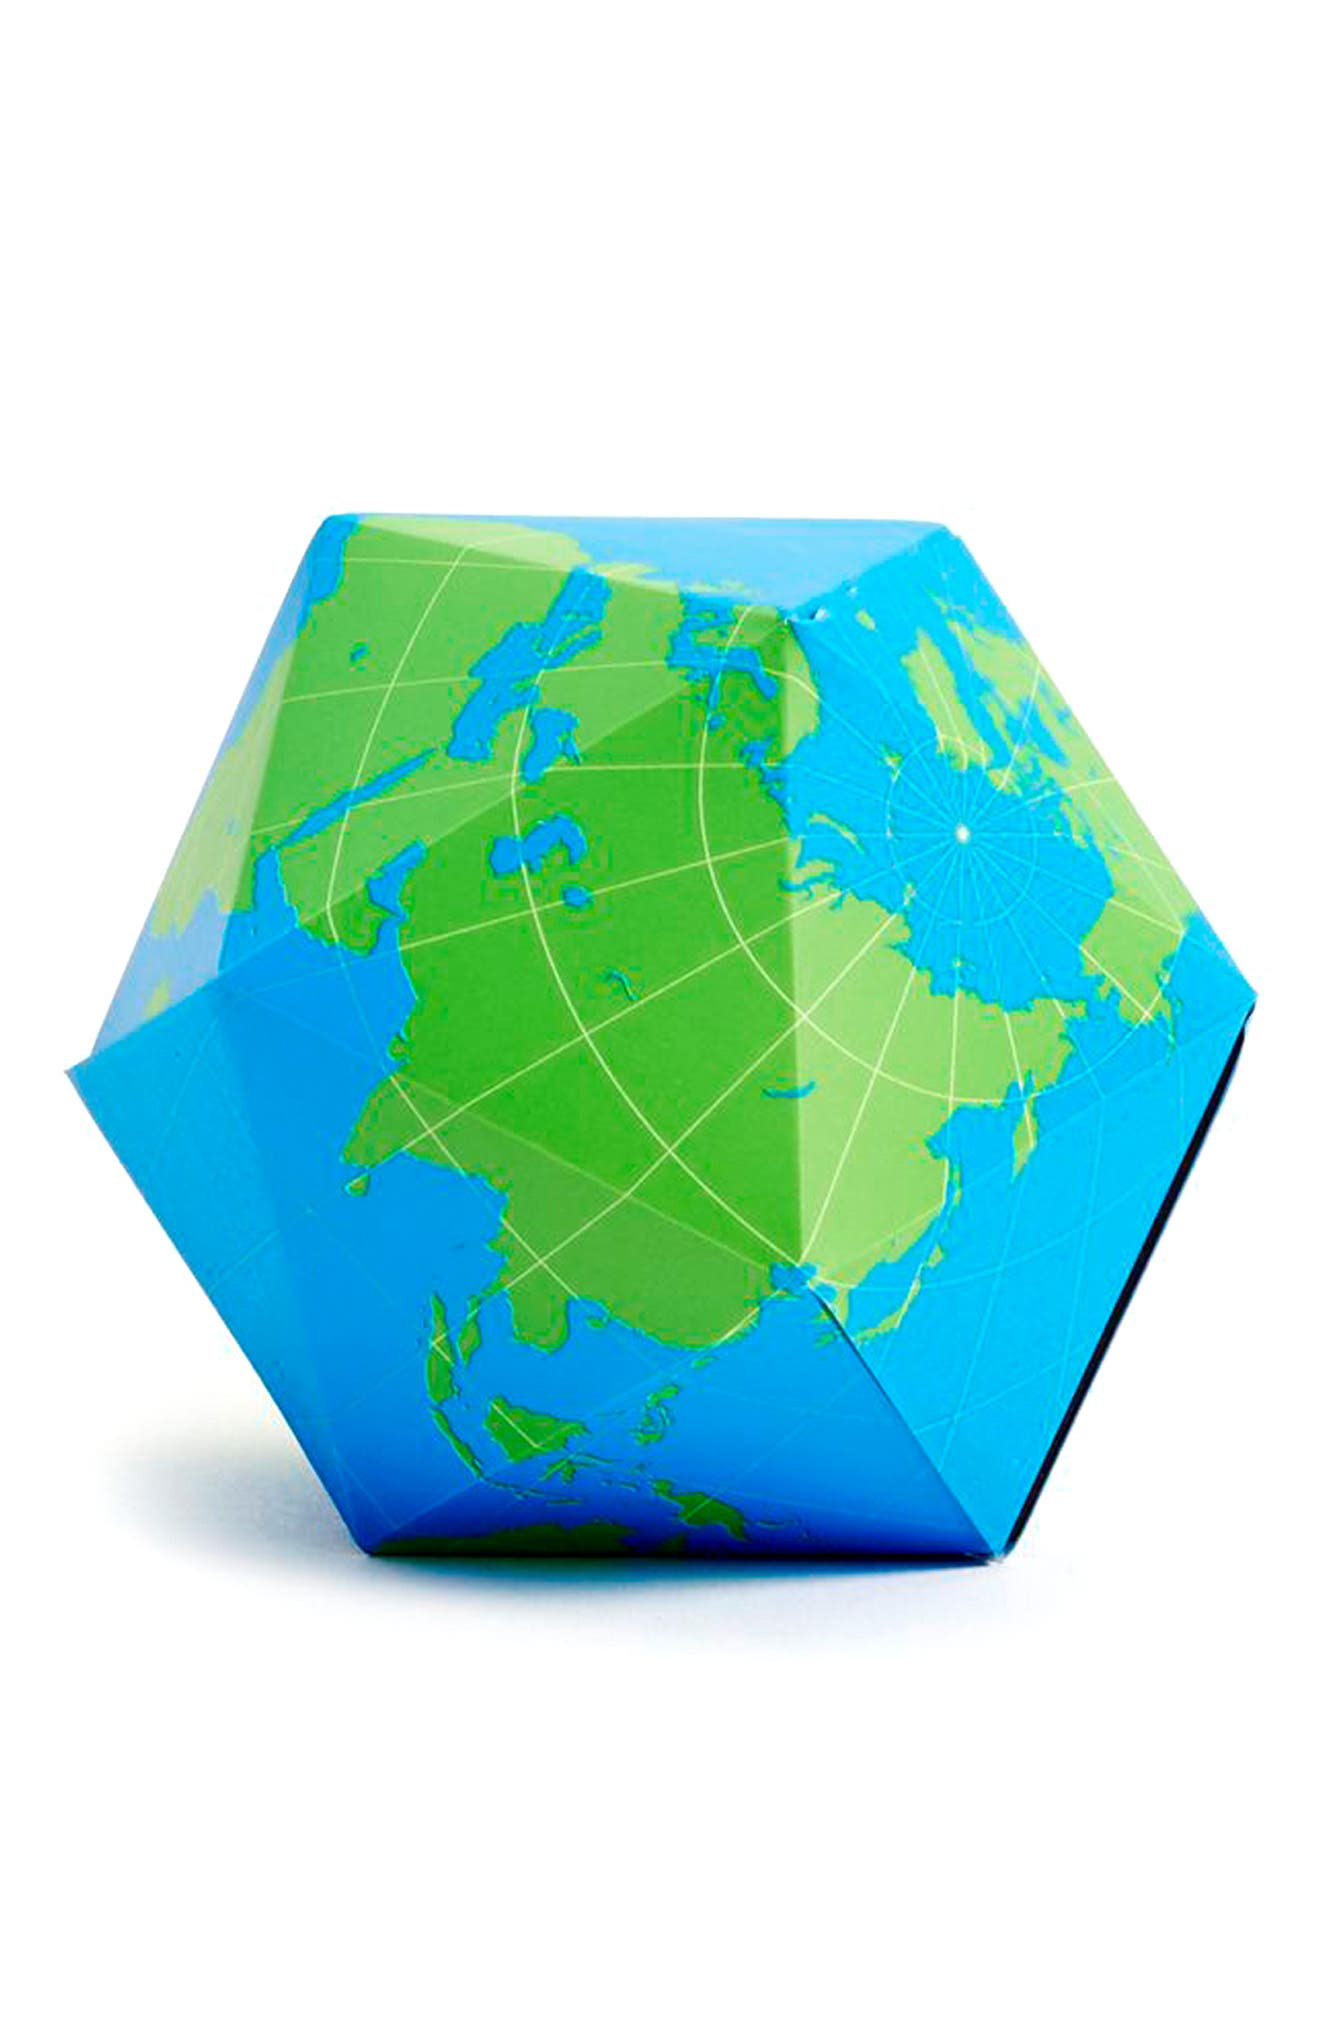 Areaware Dymaxion Magnetic Folding Geometric Globe